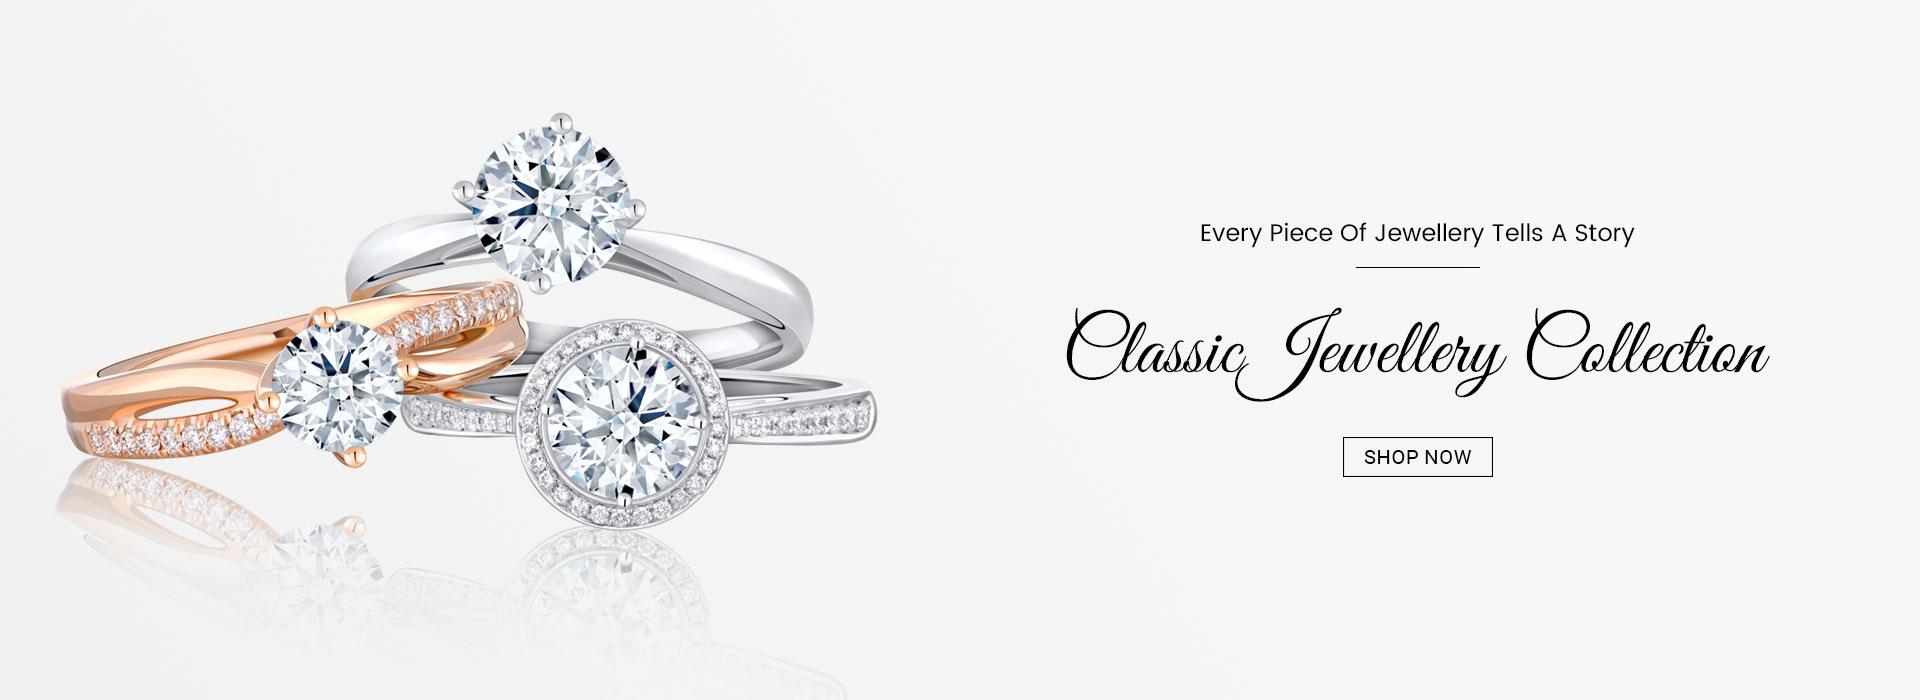 Classic Jewelry